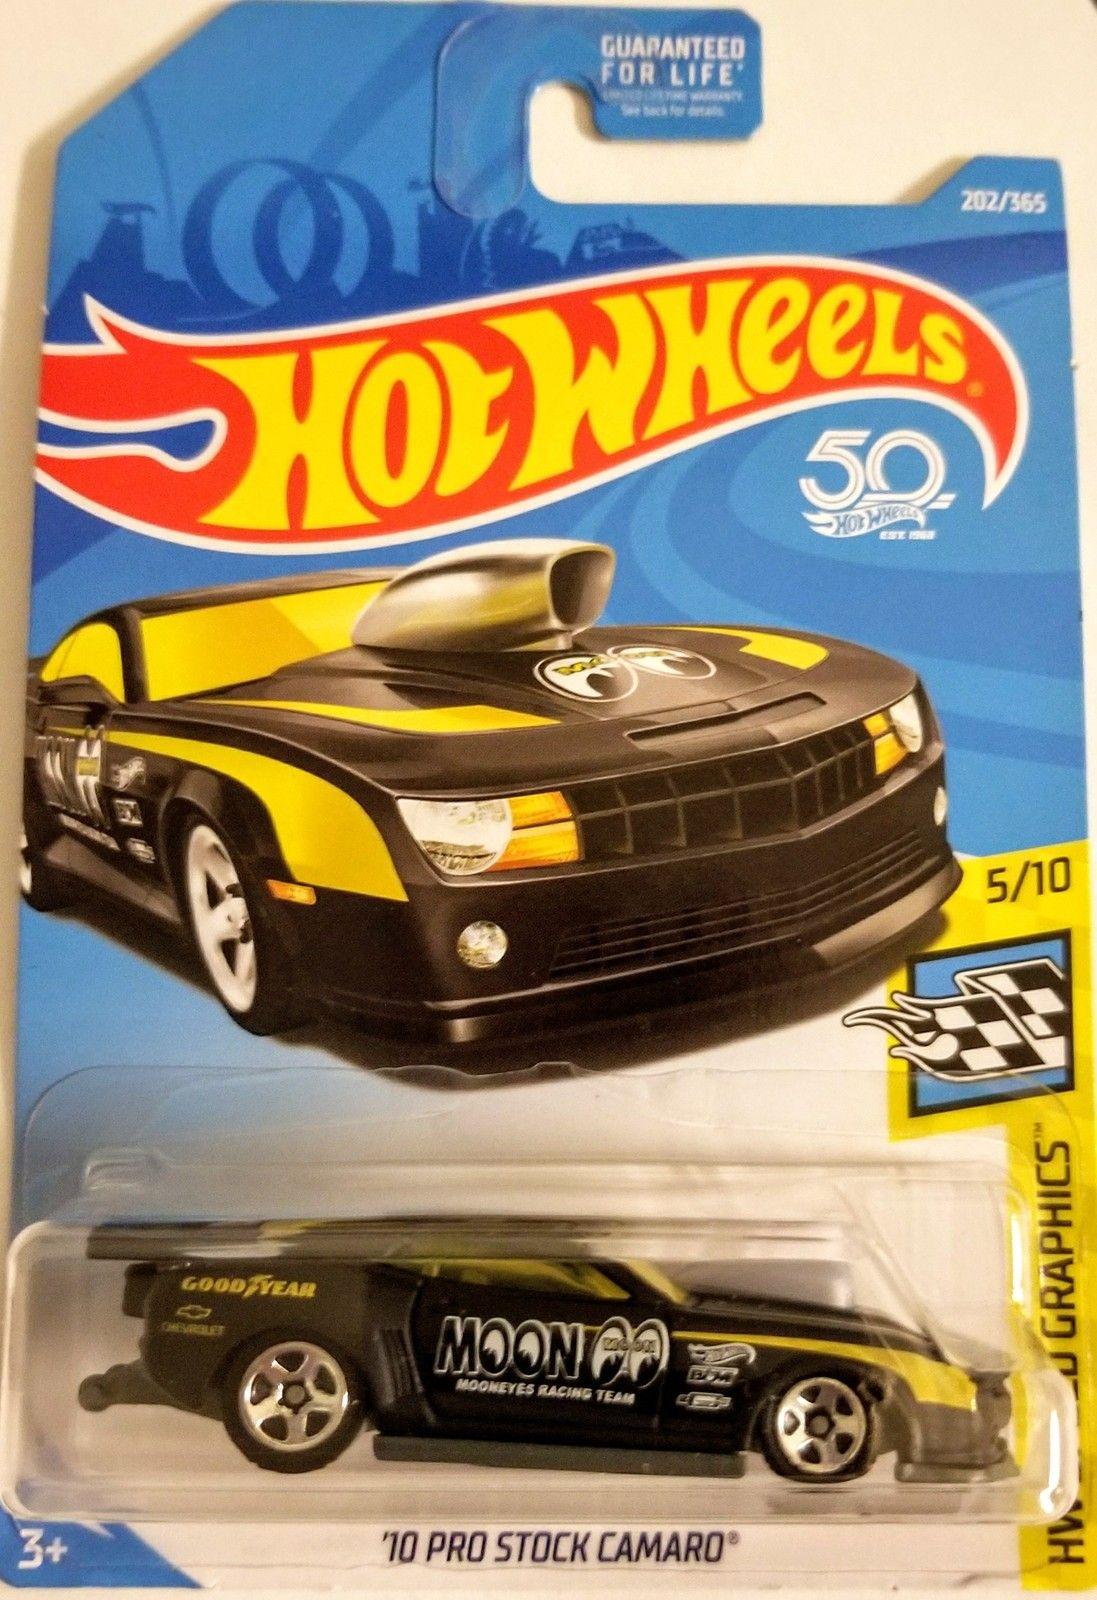 41++ Hot wheels 50 years camaro ideas in 2021